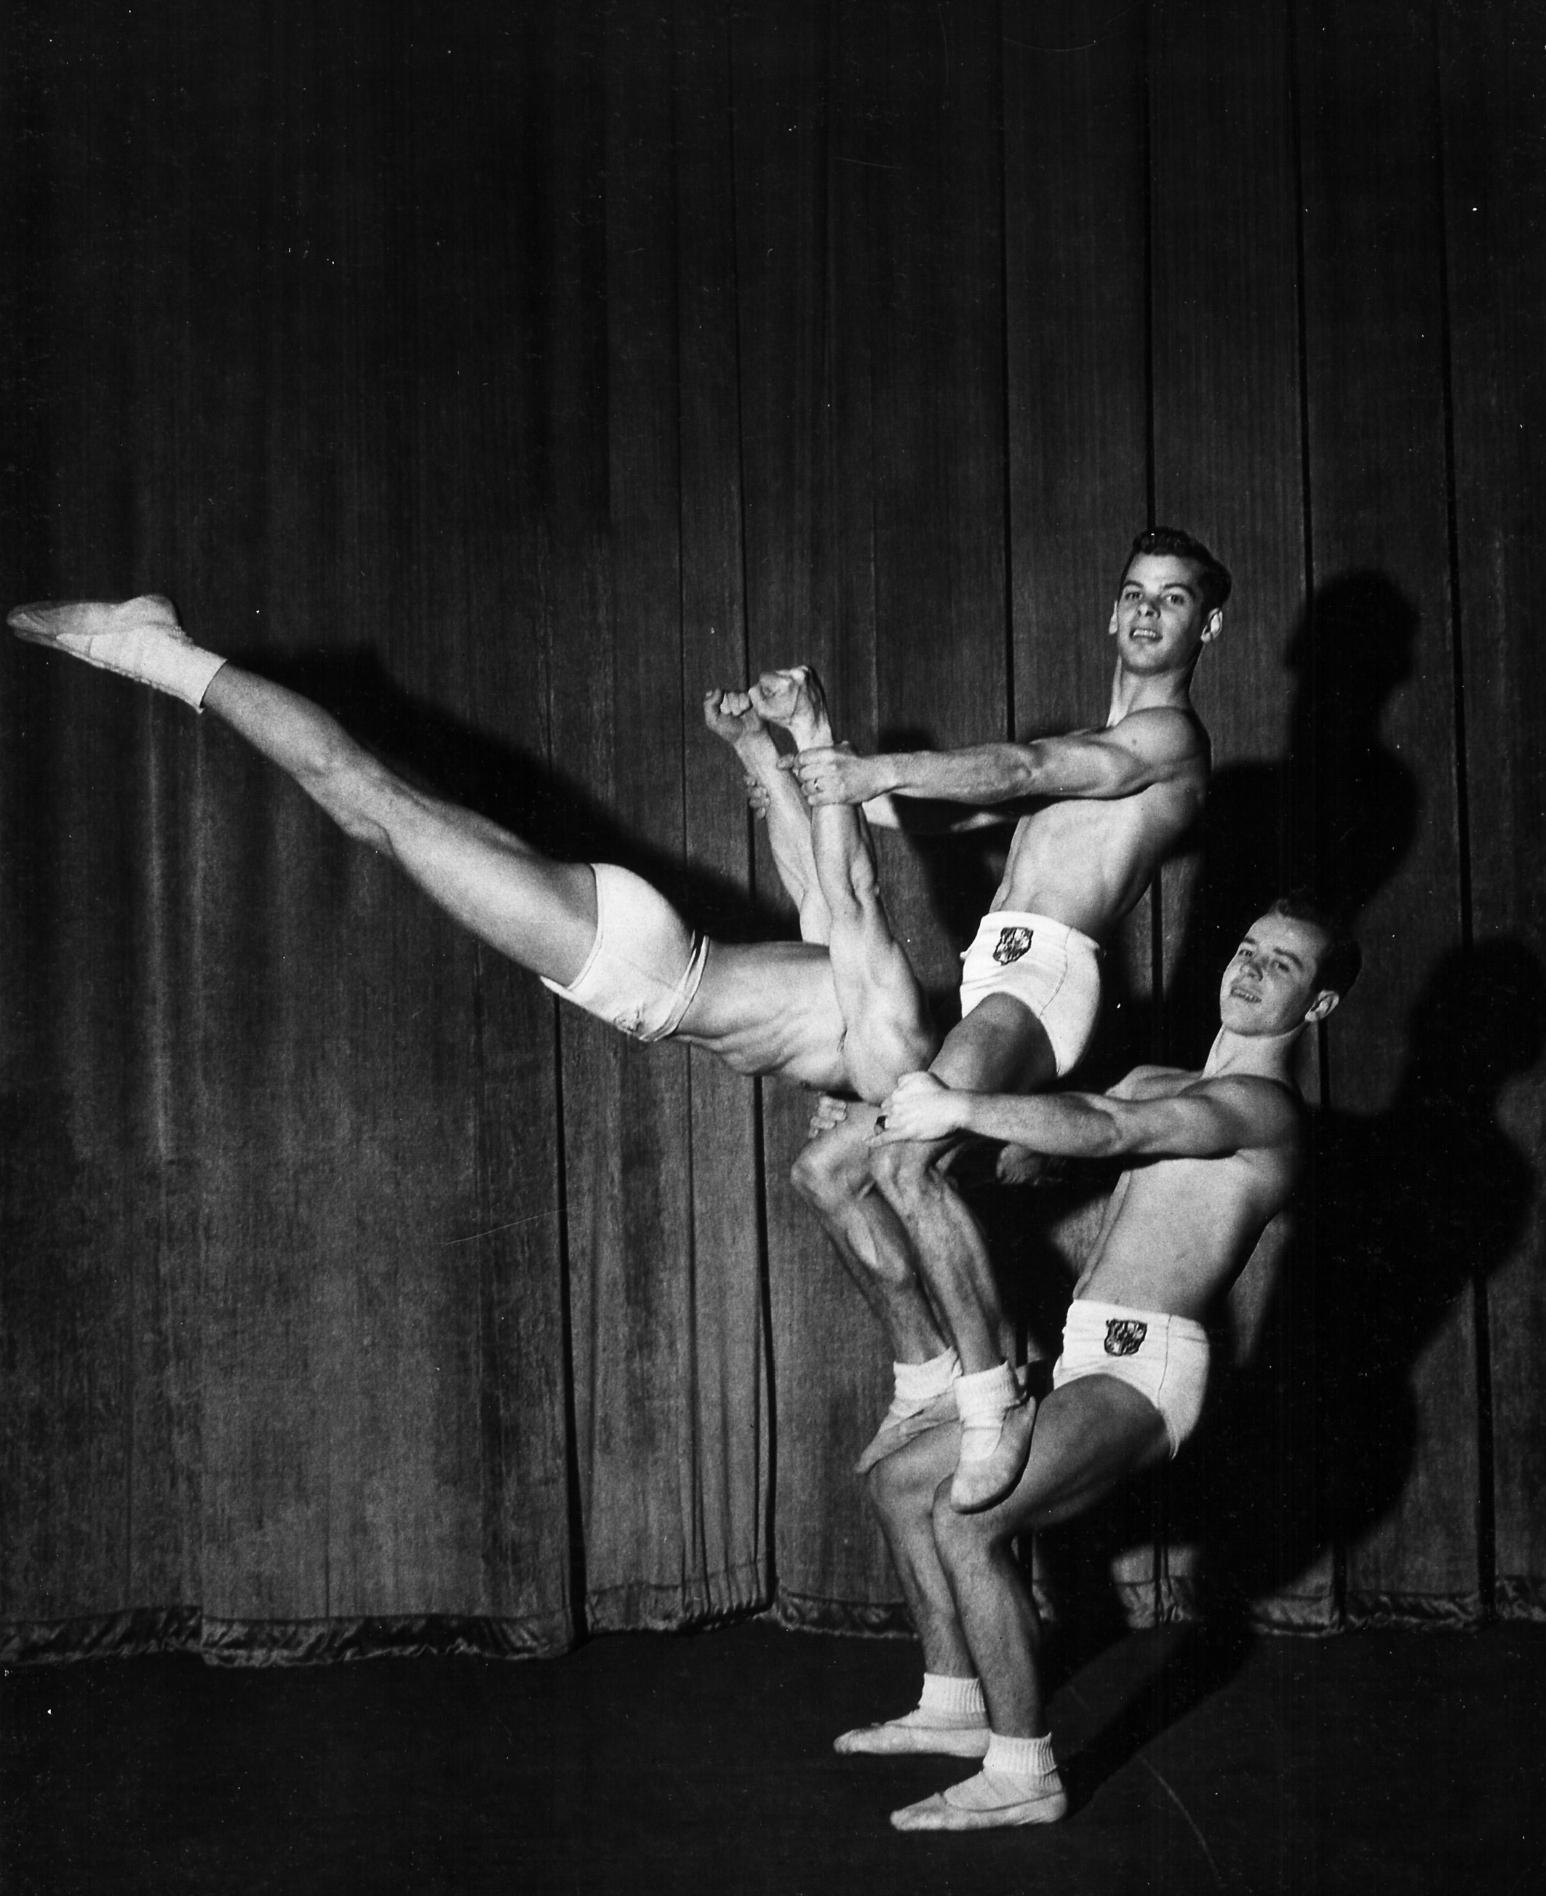 Men's Triples Balancing (1950)